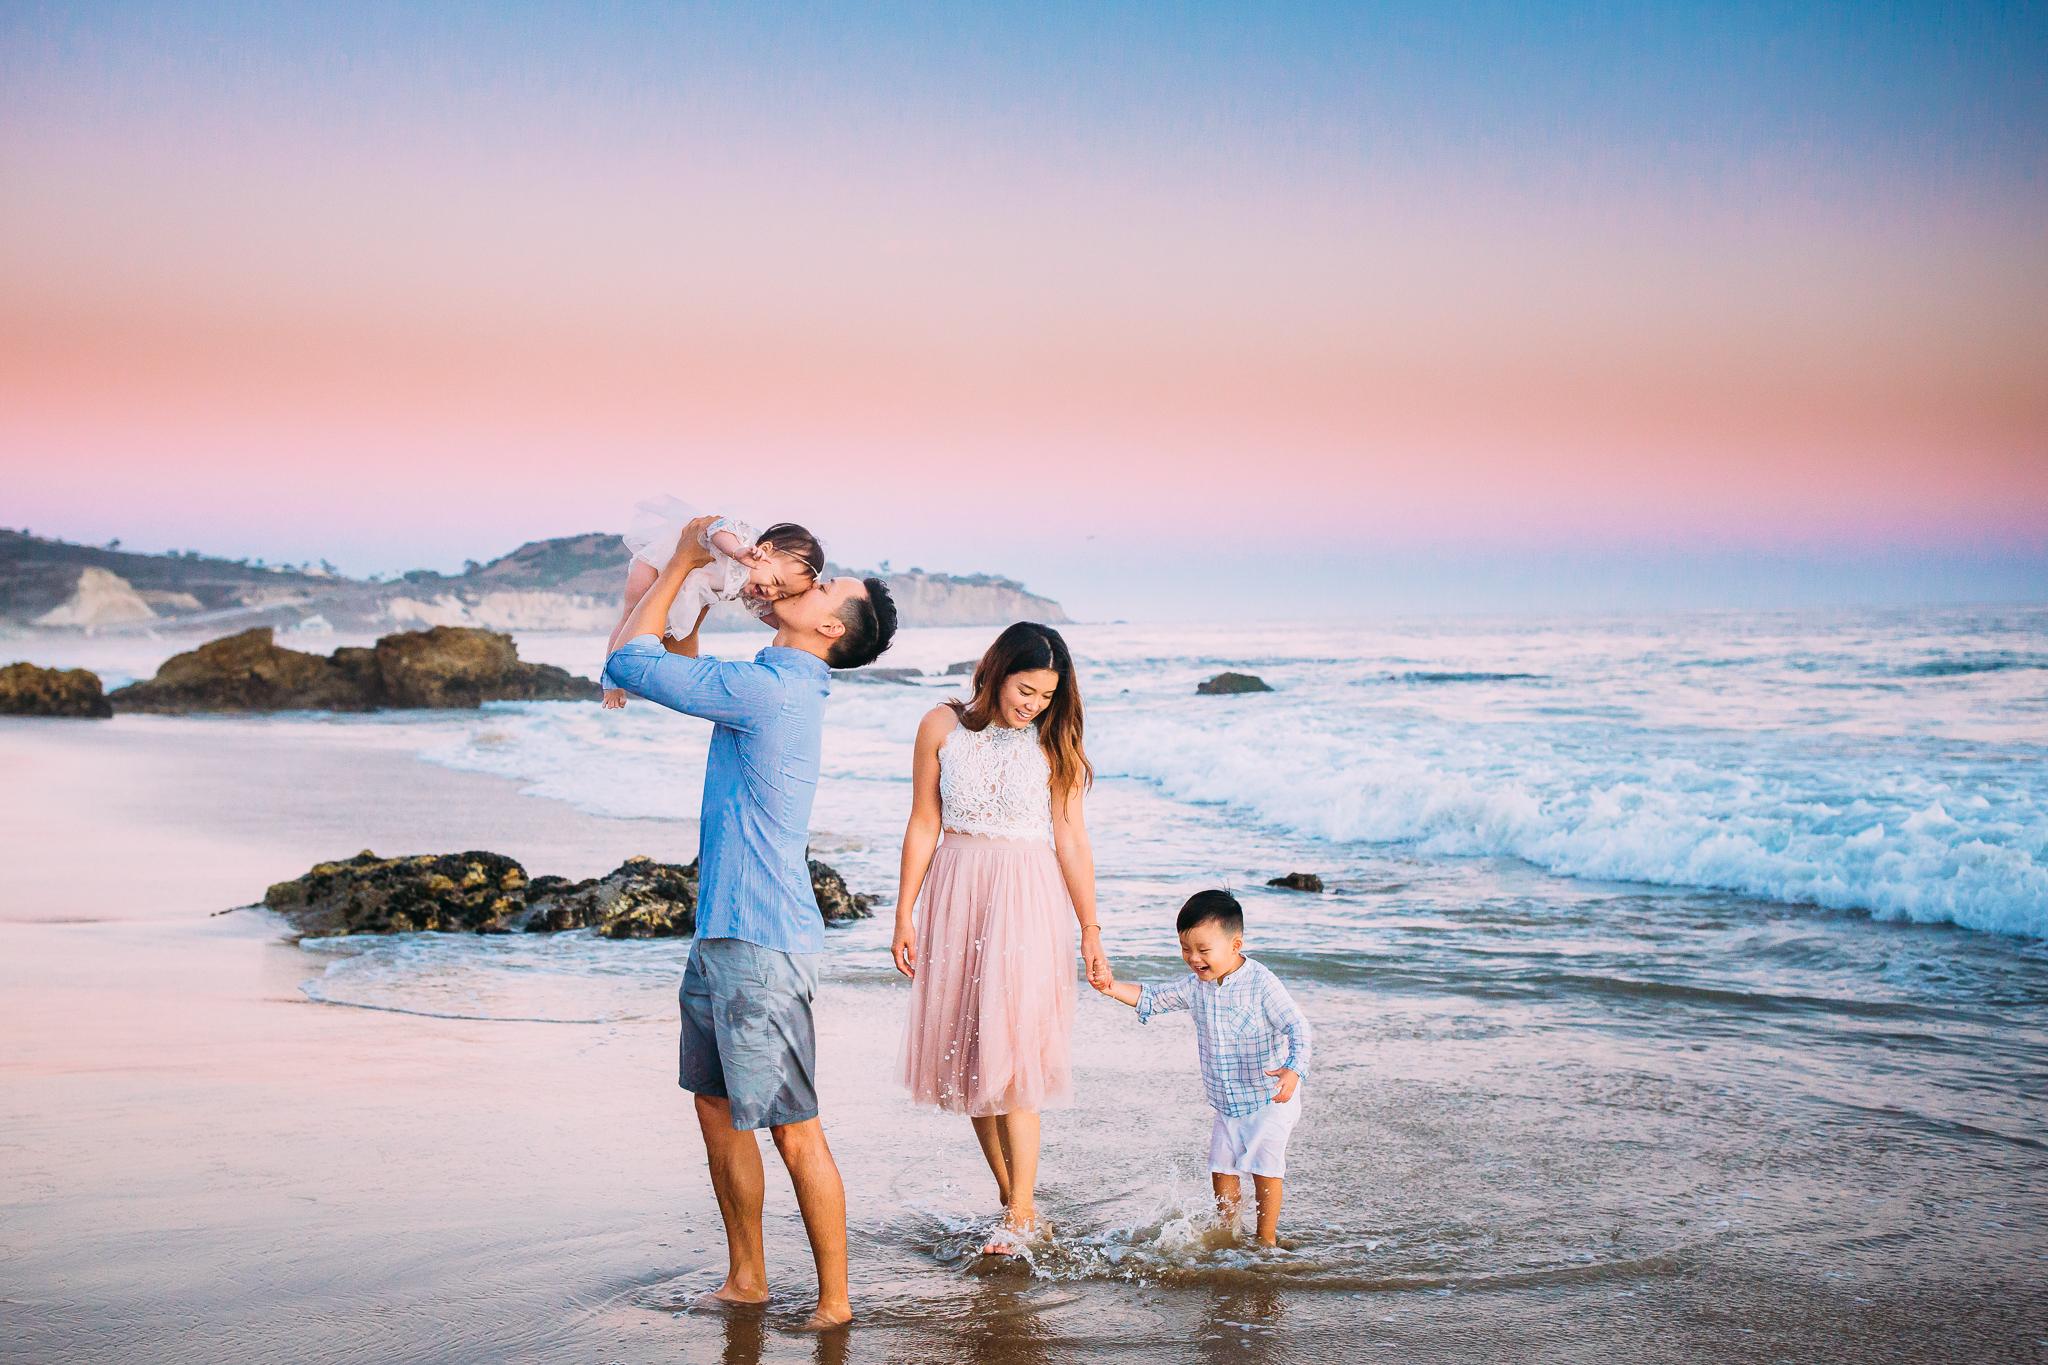 newportbeachfamilyphotographer-6.jpg